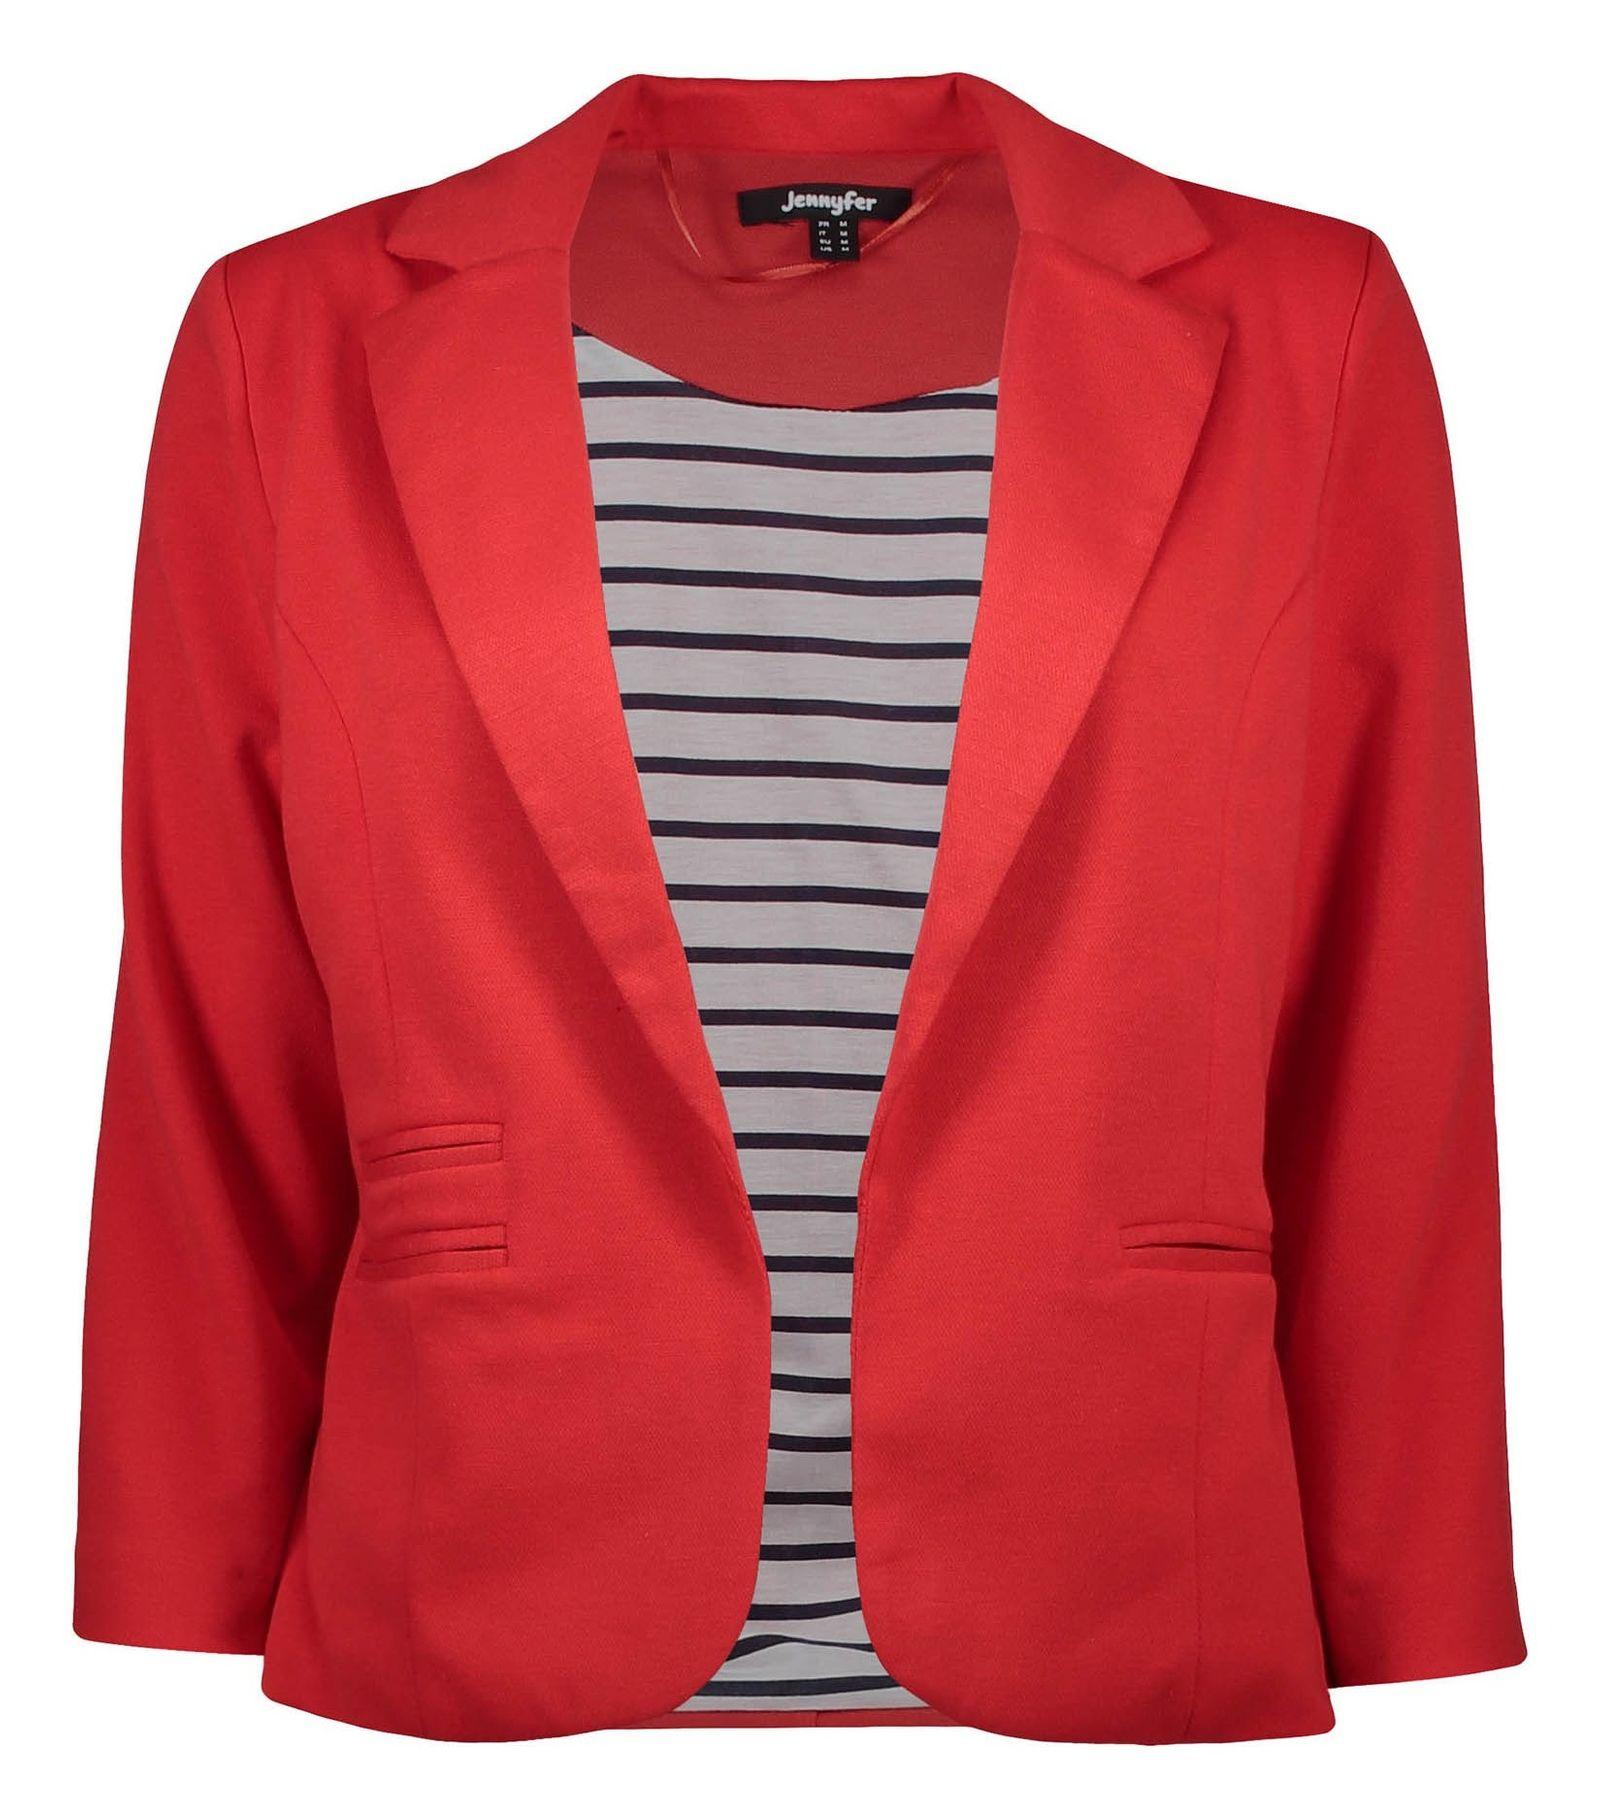 کت کوتاه زنانه - جنیفر - قرمز - 1